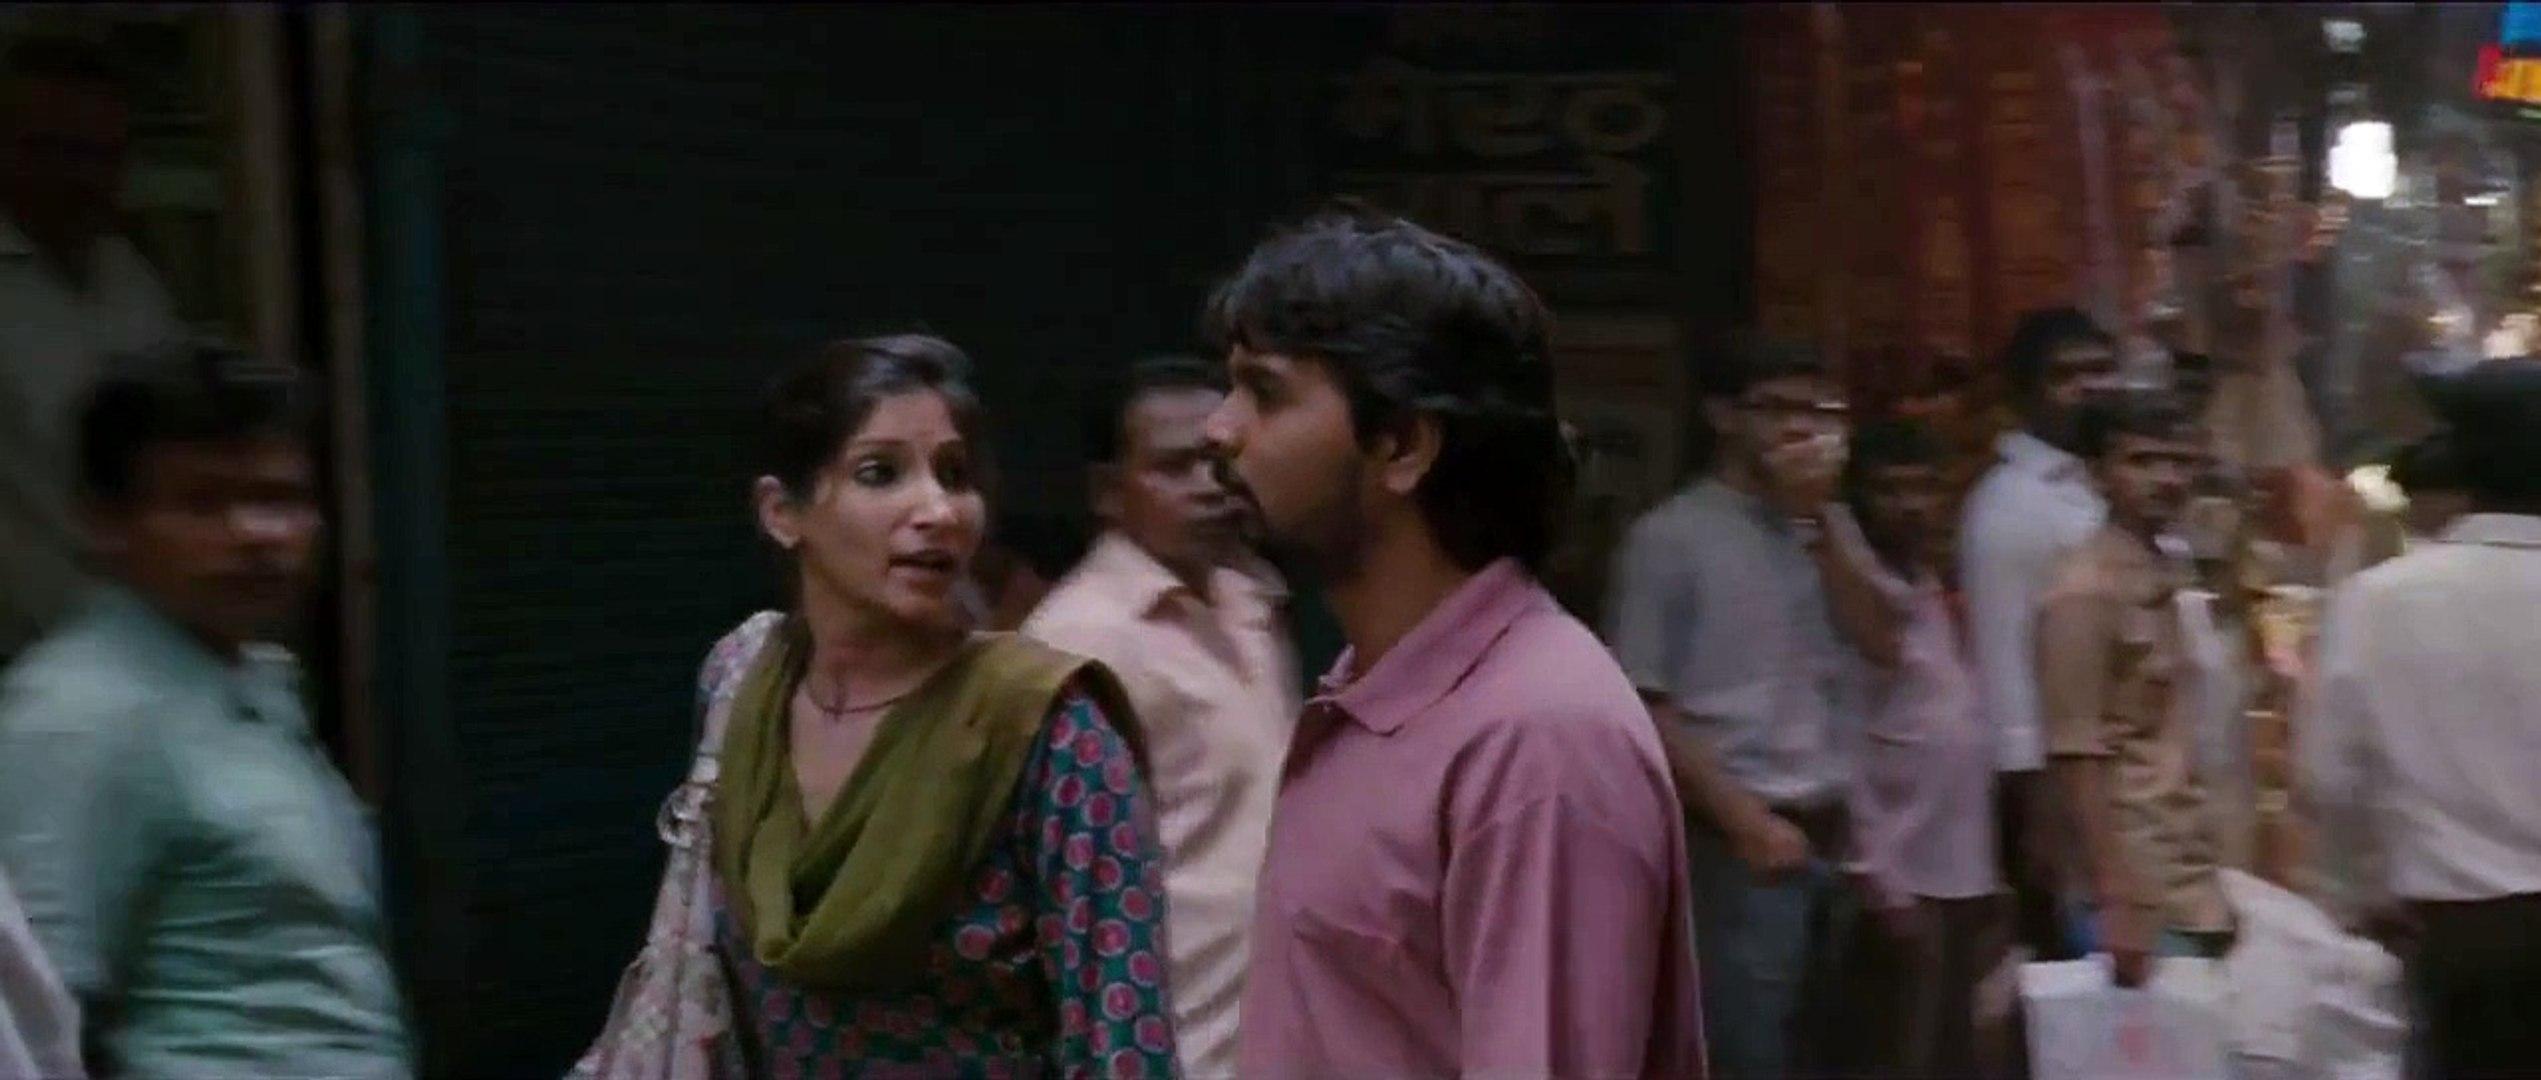 WWW.DOWNVIDS.NET-Hindi Movies 2014 Full Movie - Best Comedy Movies - Bollywood Movies - Romantic Mov